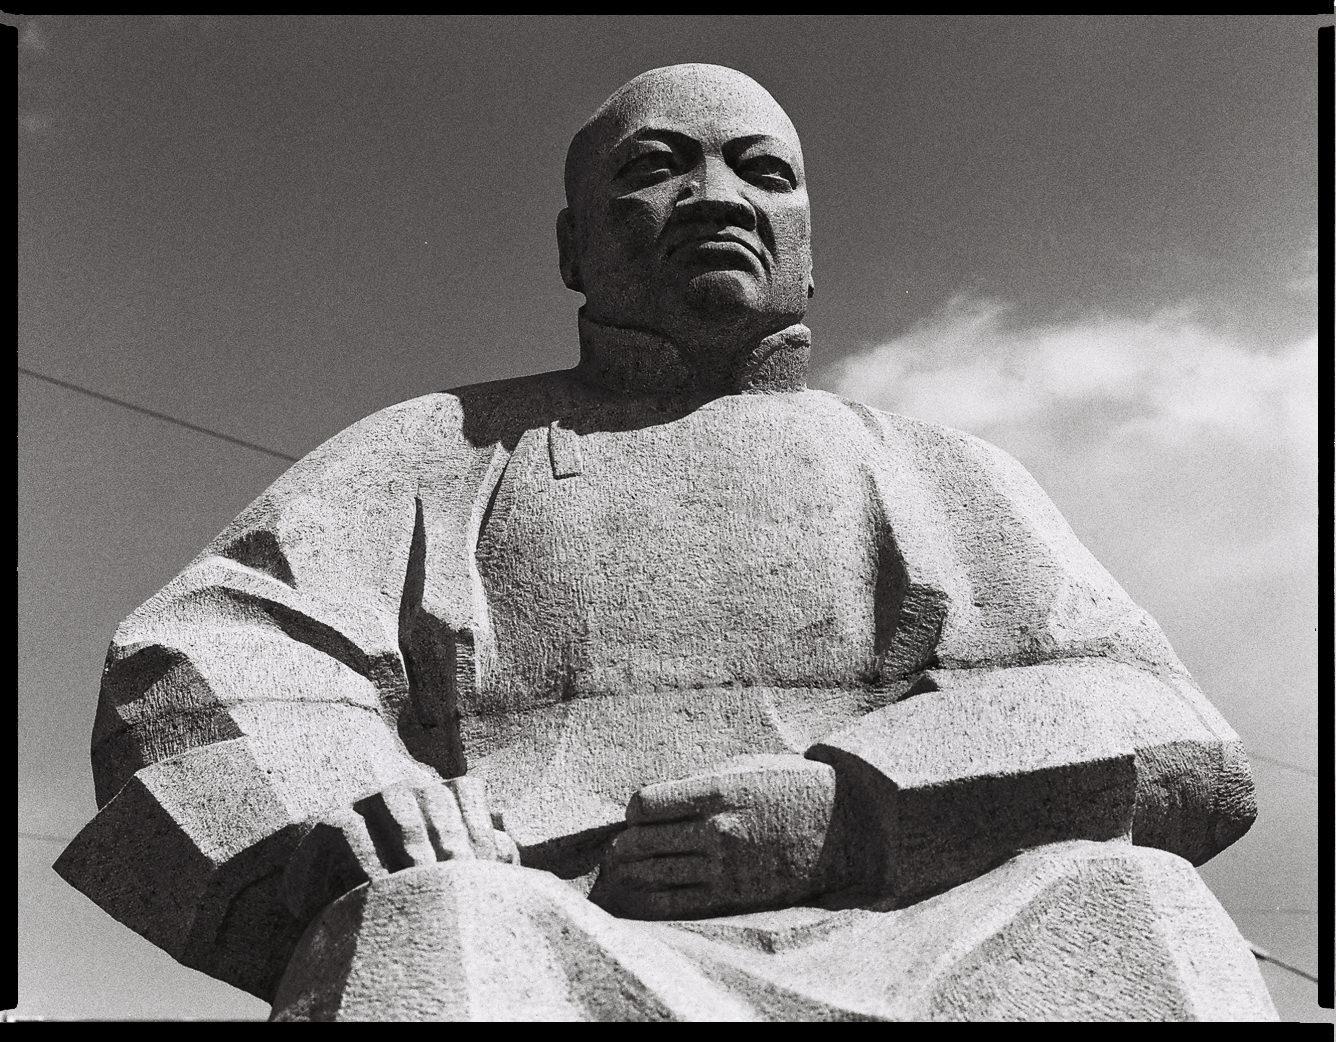 MediumFormatPatrikWallner_Mongolia_MrBusiness